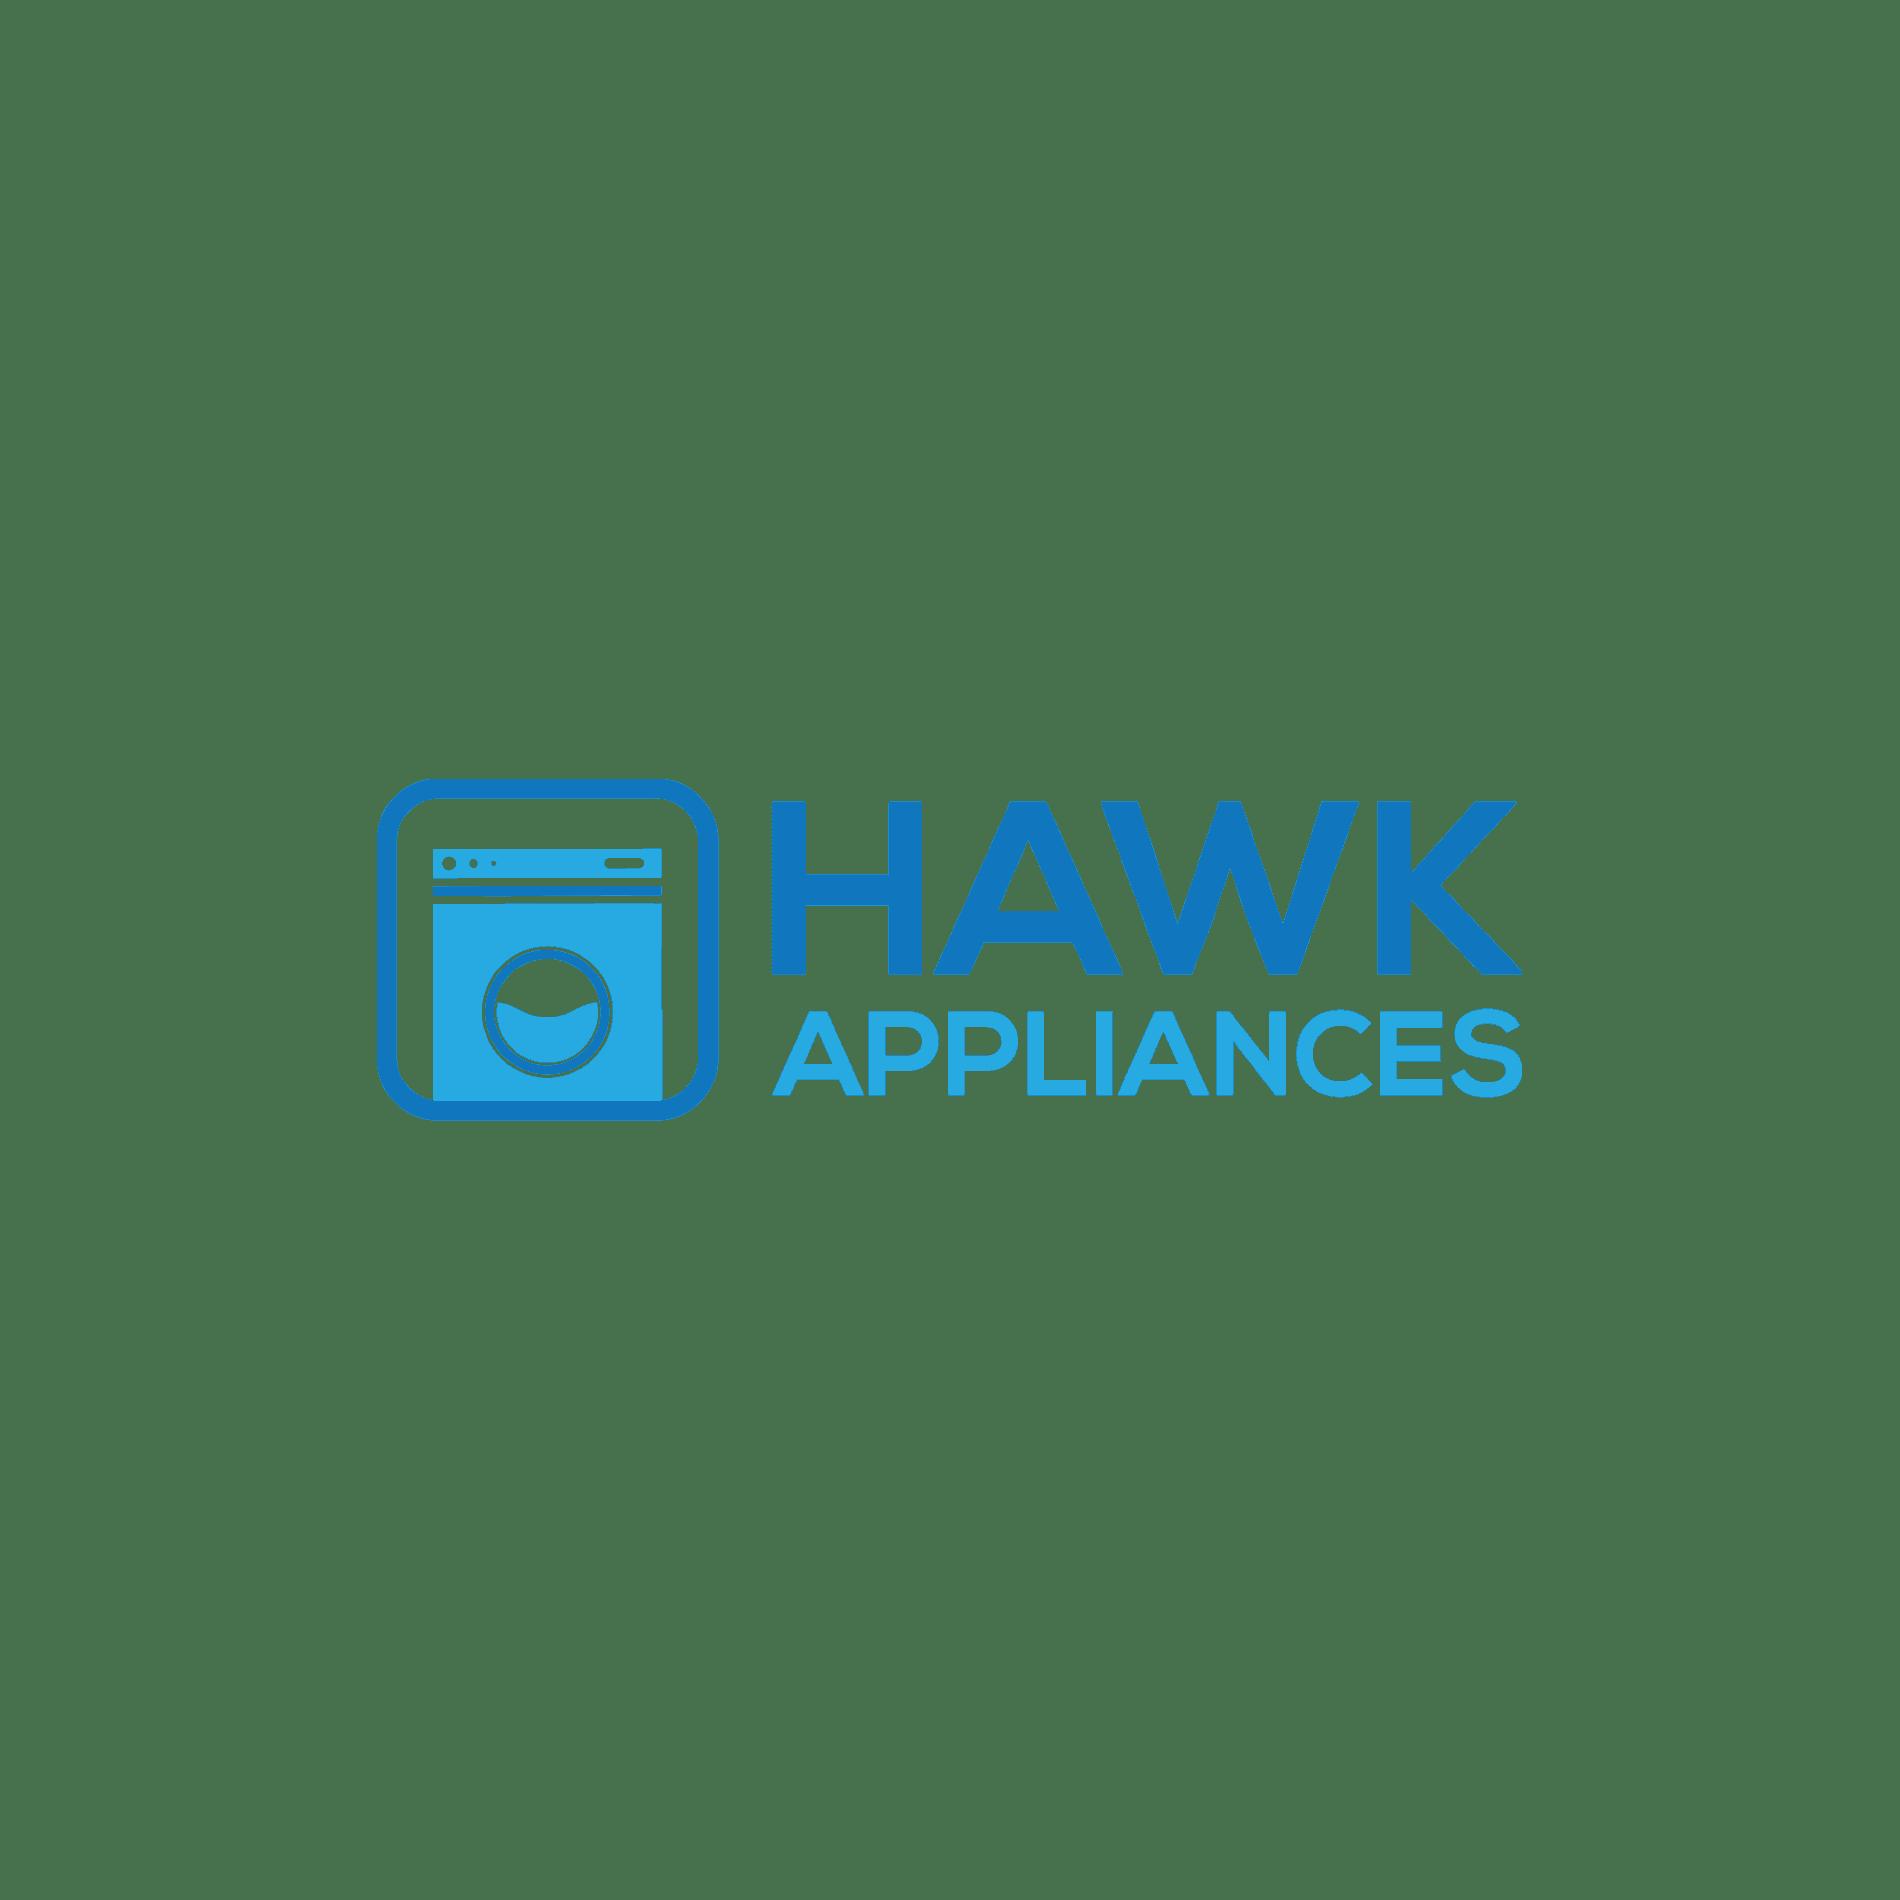 Hawk Appliances Limited